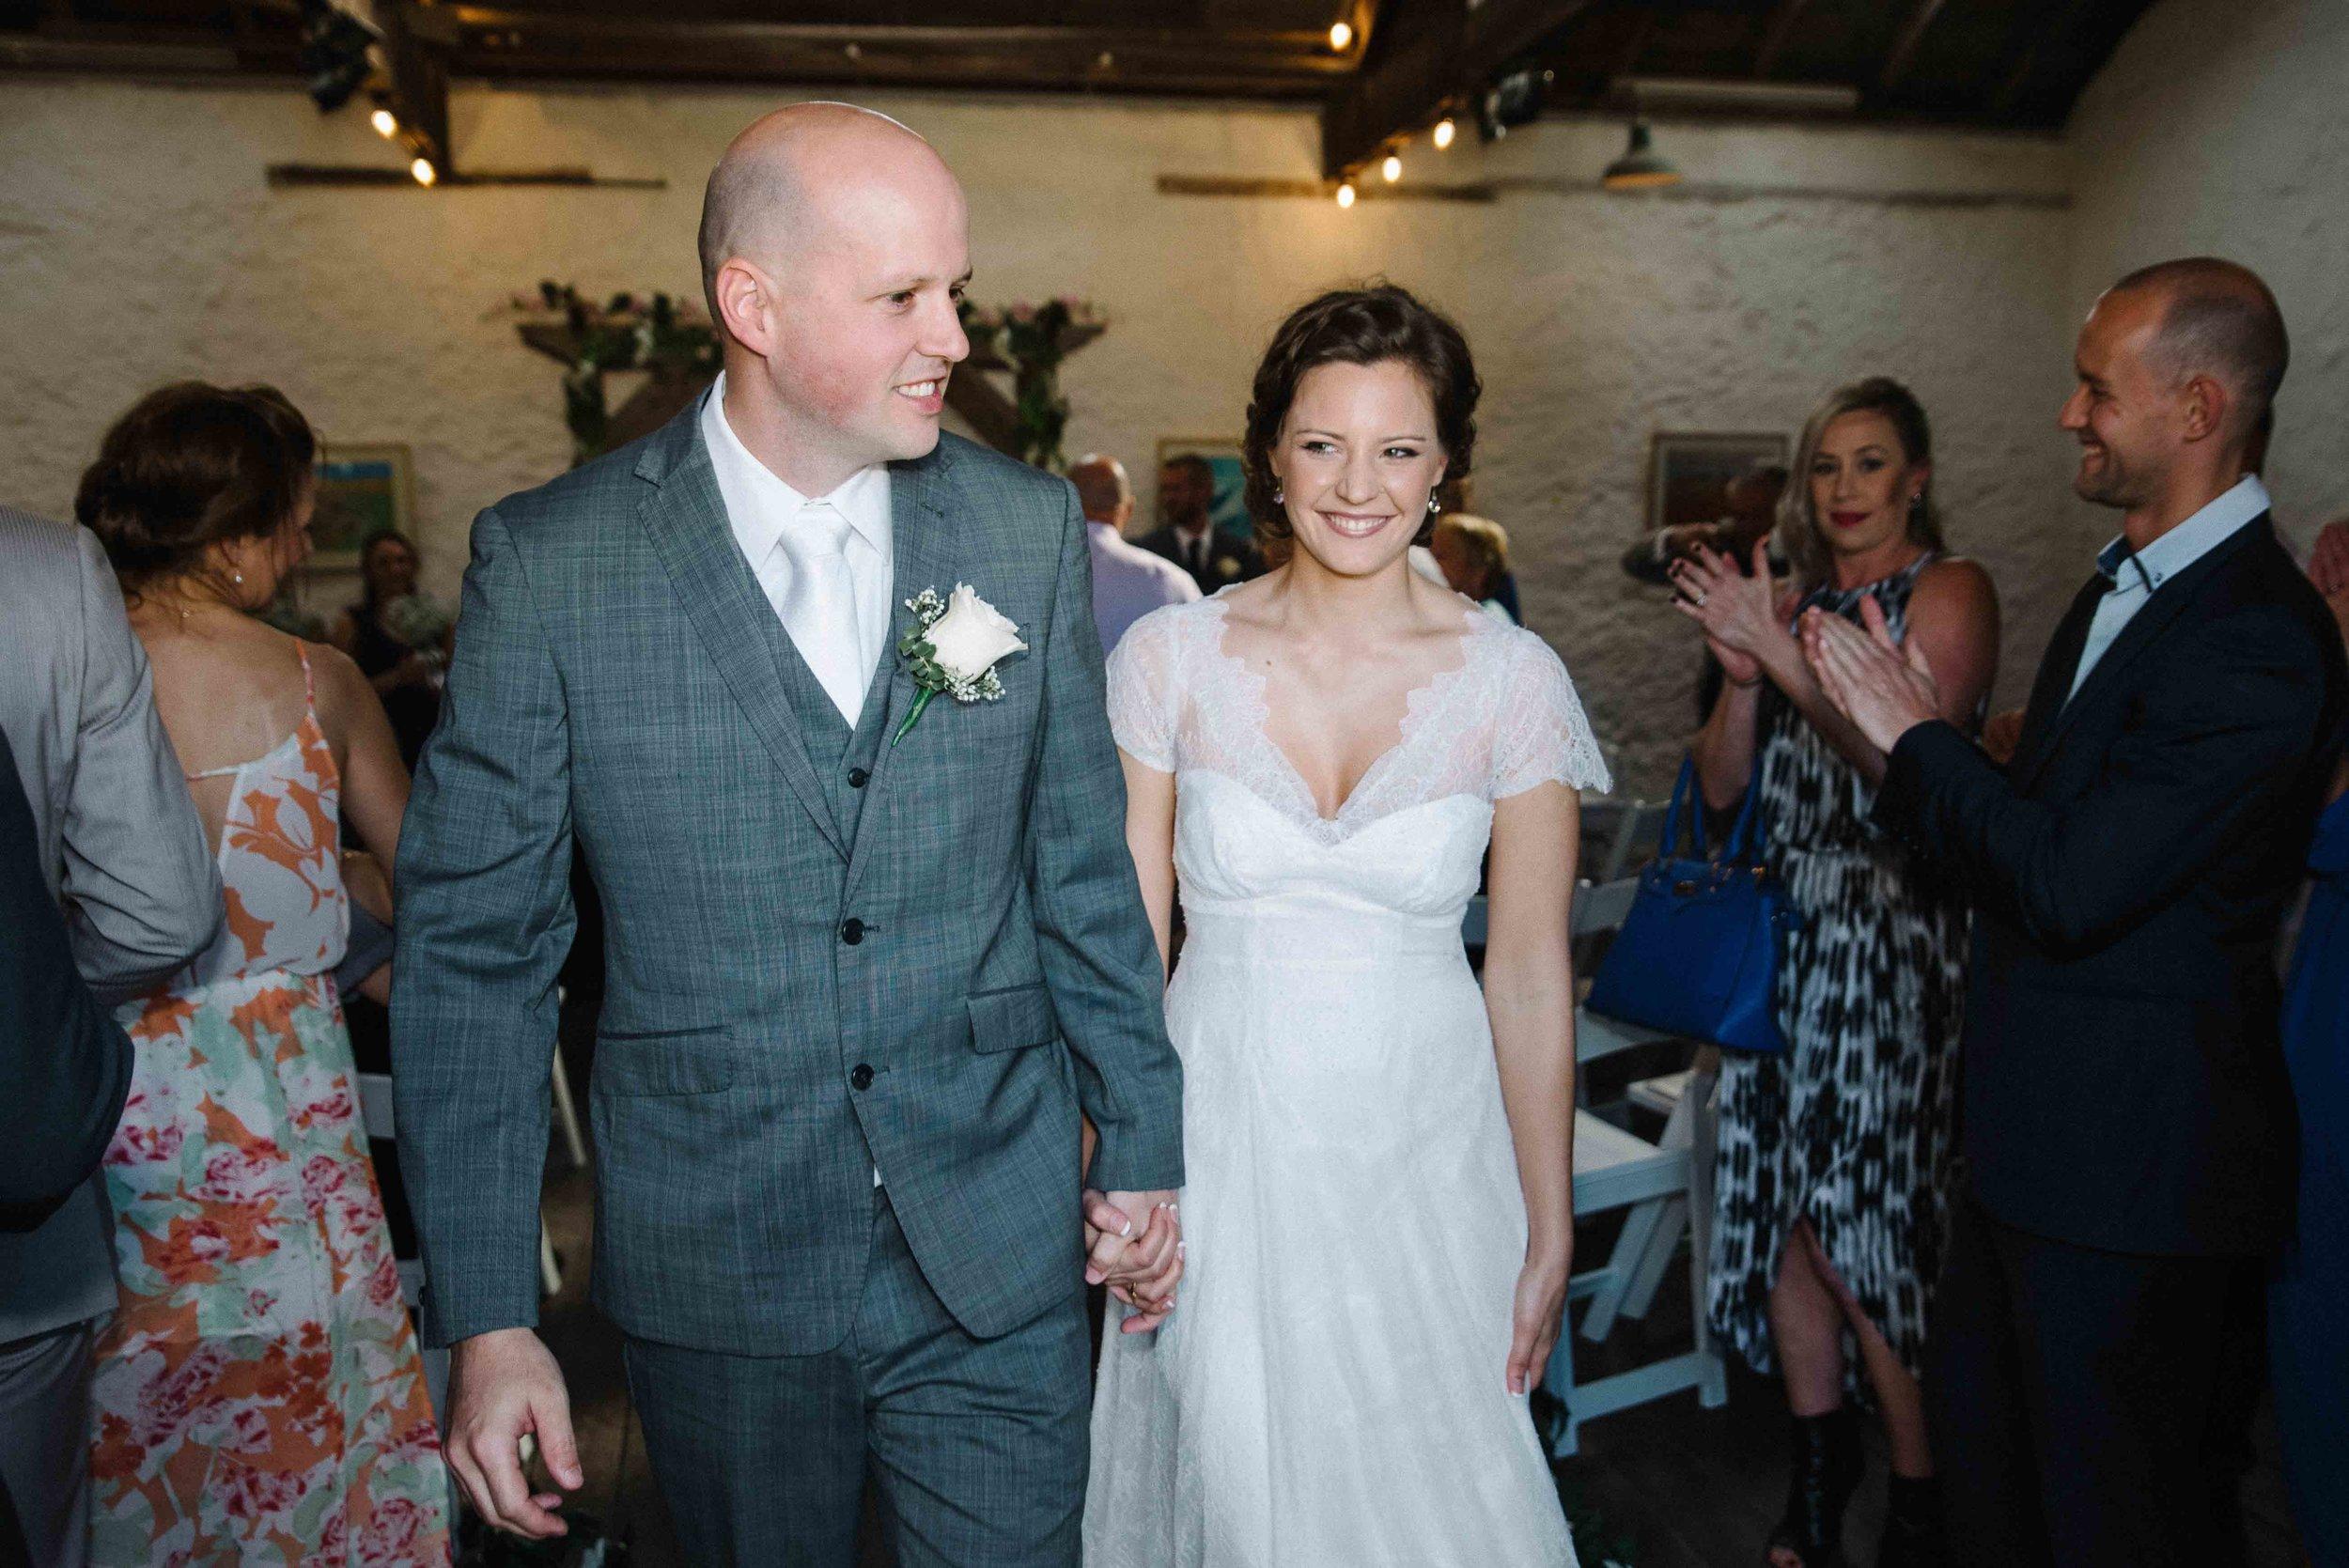 38-candid natural wedding photography fremantle.jpg